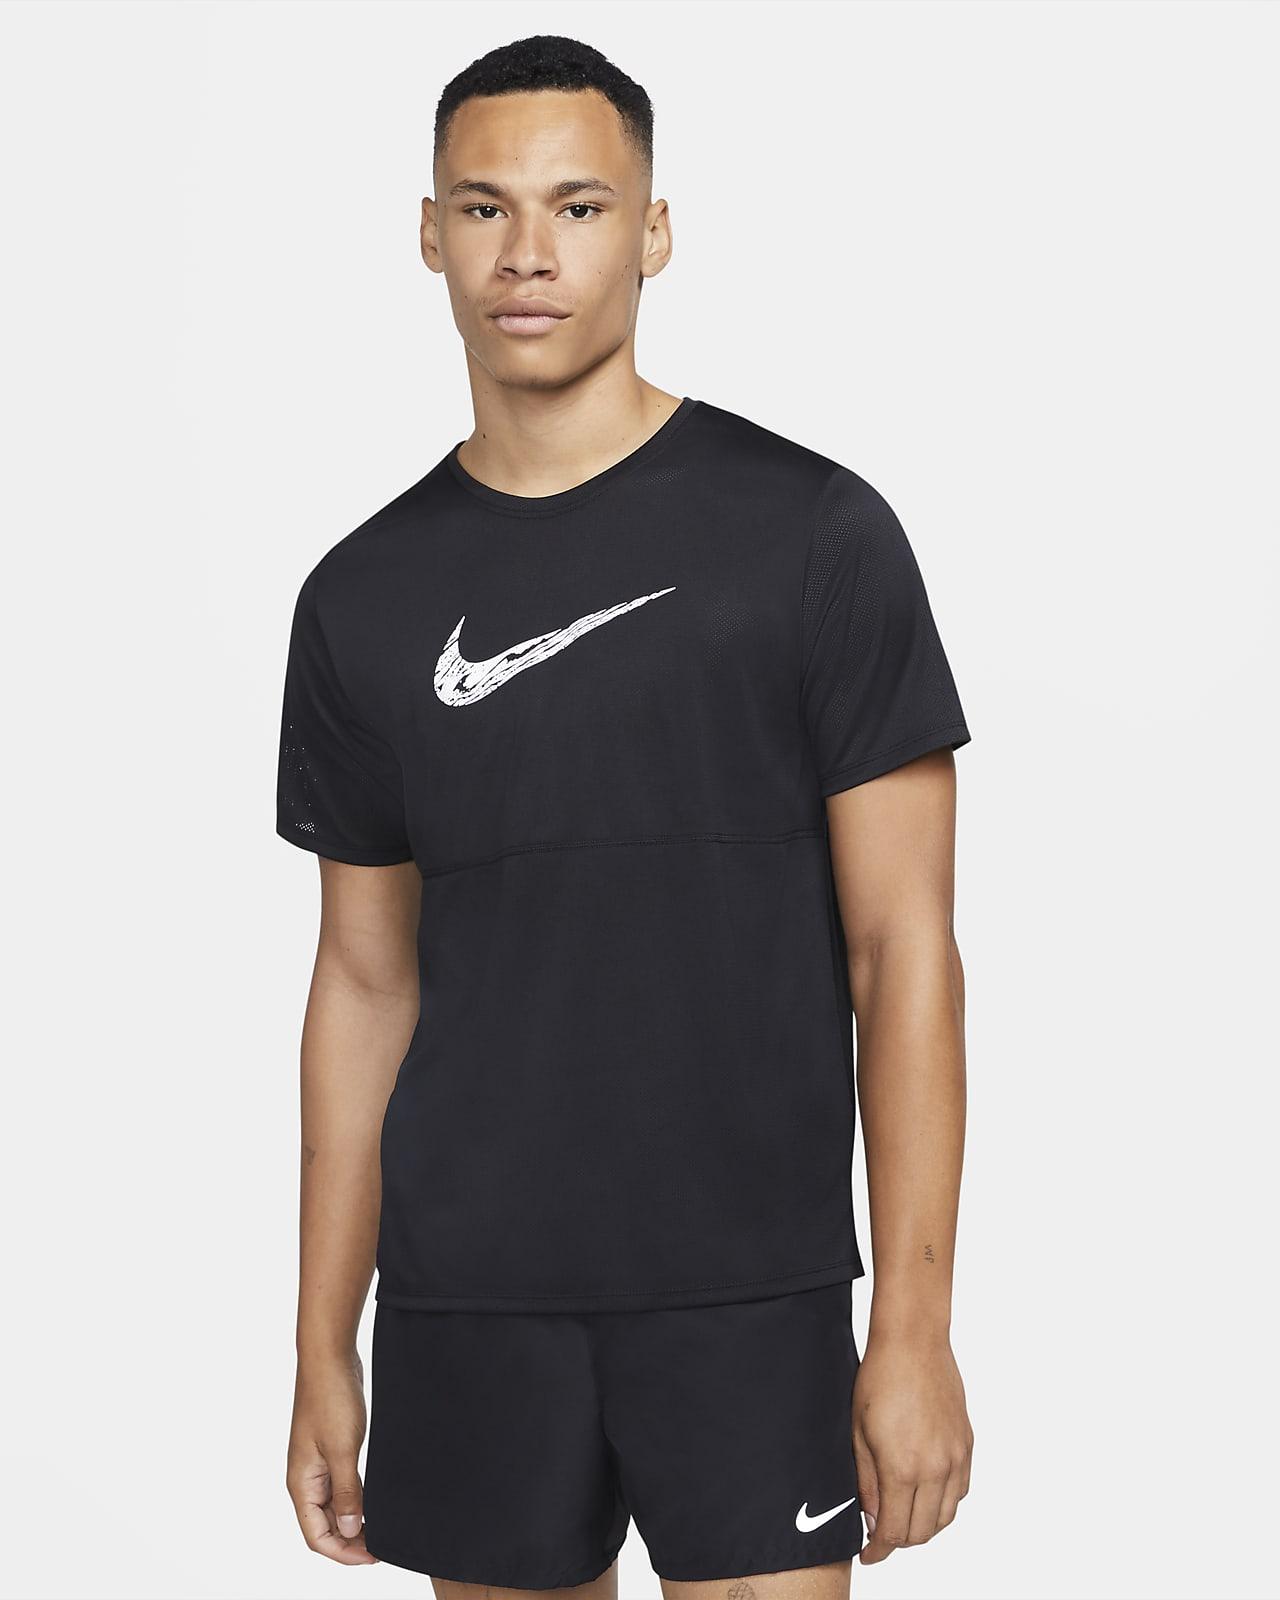 Nike Breathe Wild Run Men's Running Top